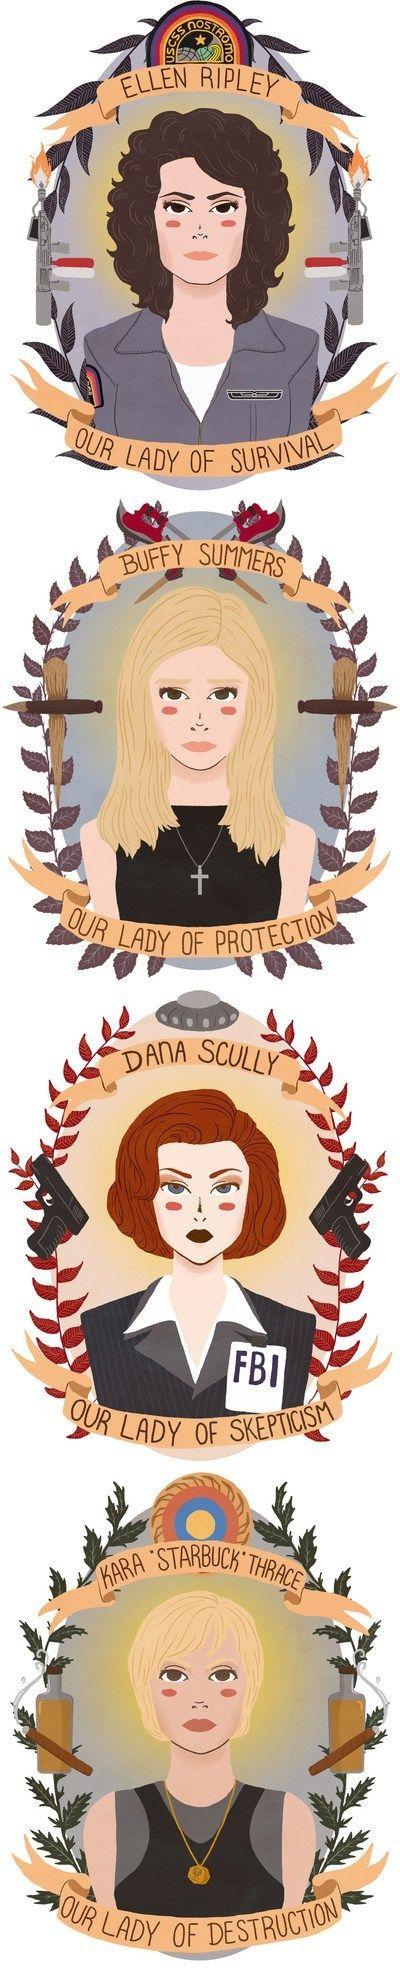 Patron Saints of Sci-Fi (and Fantasy)